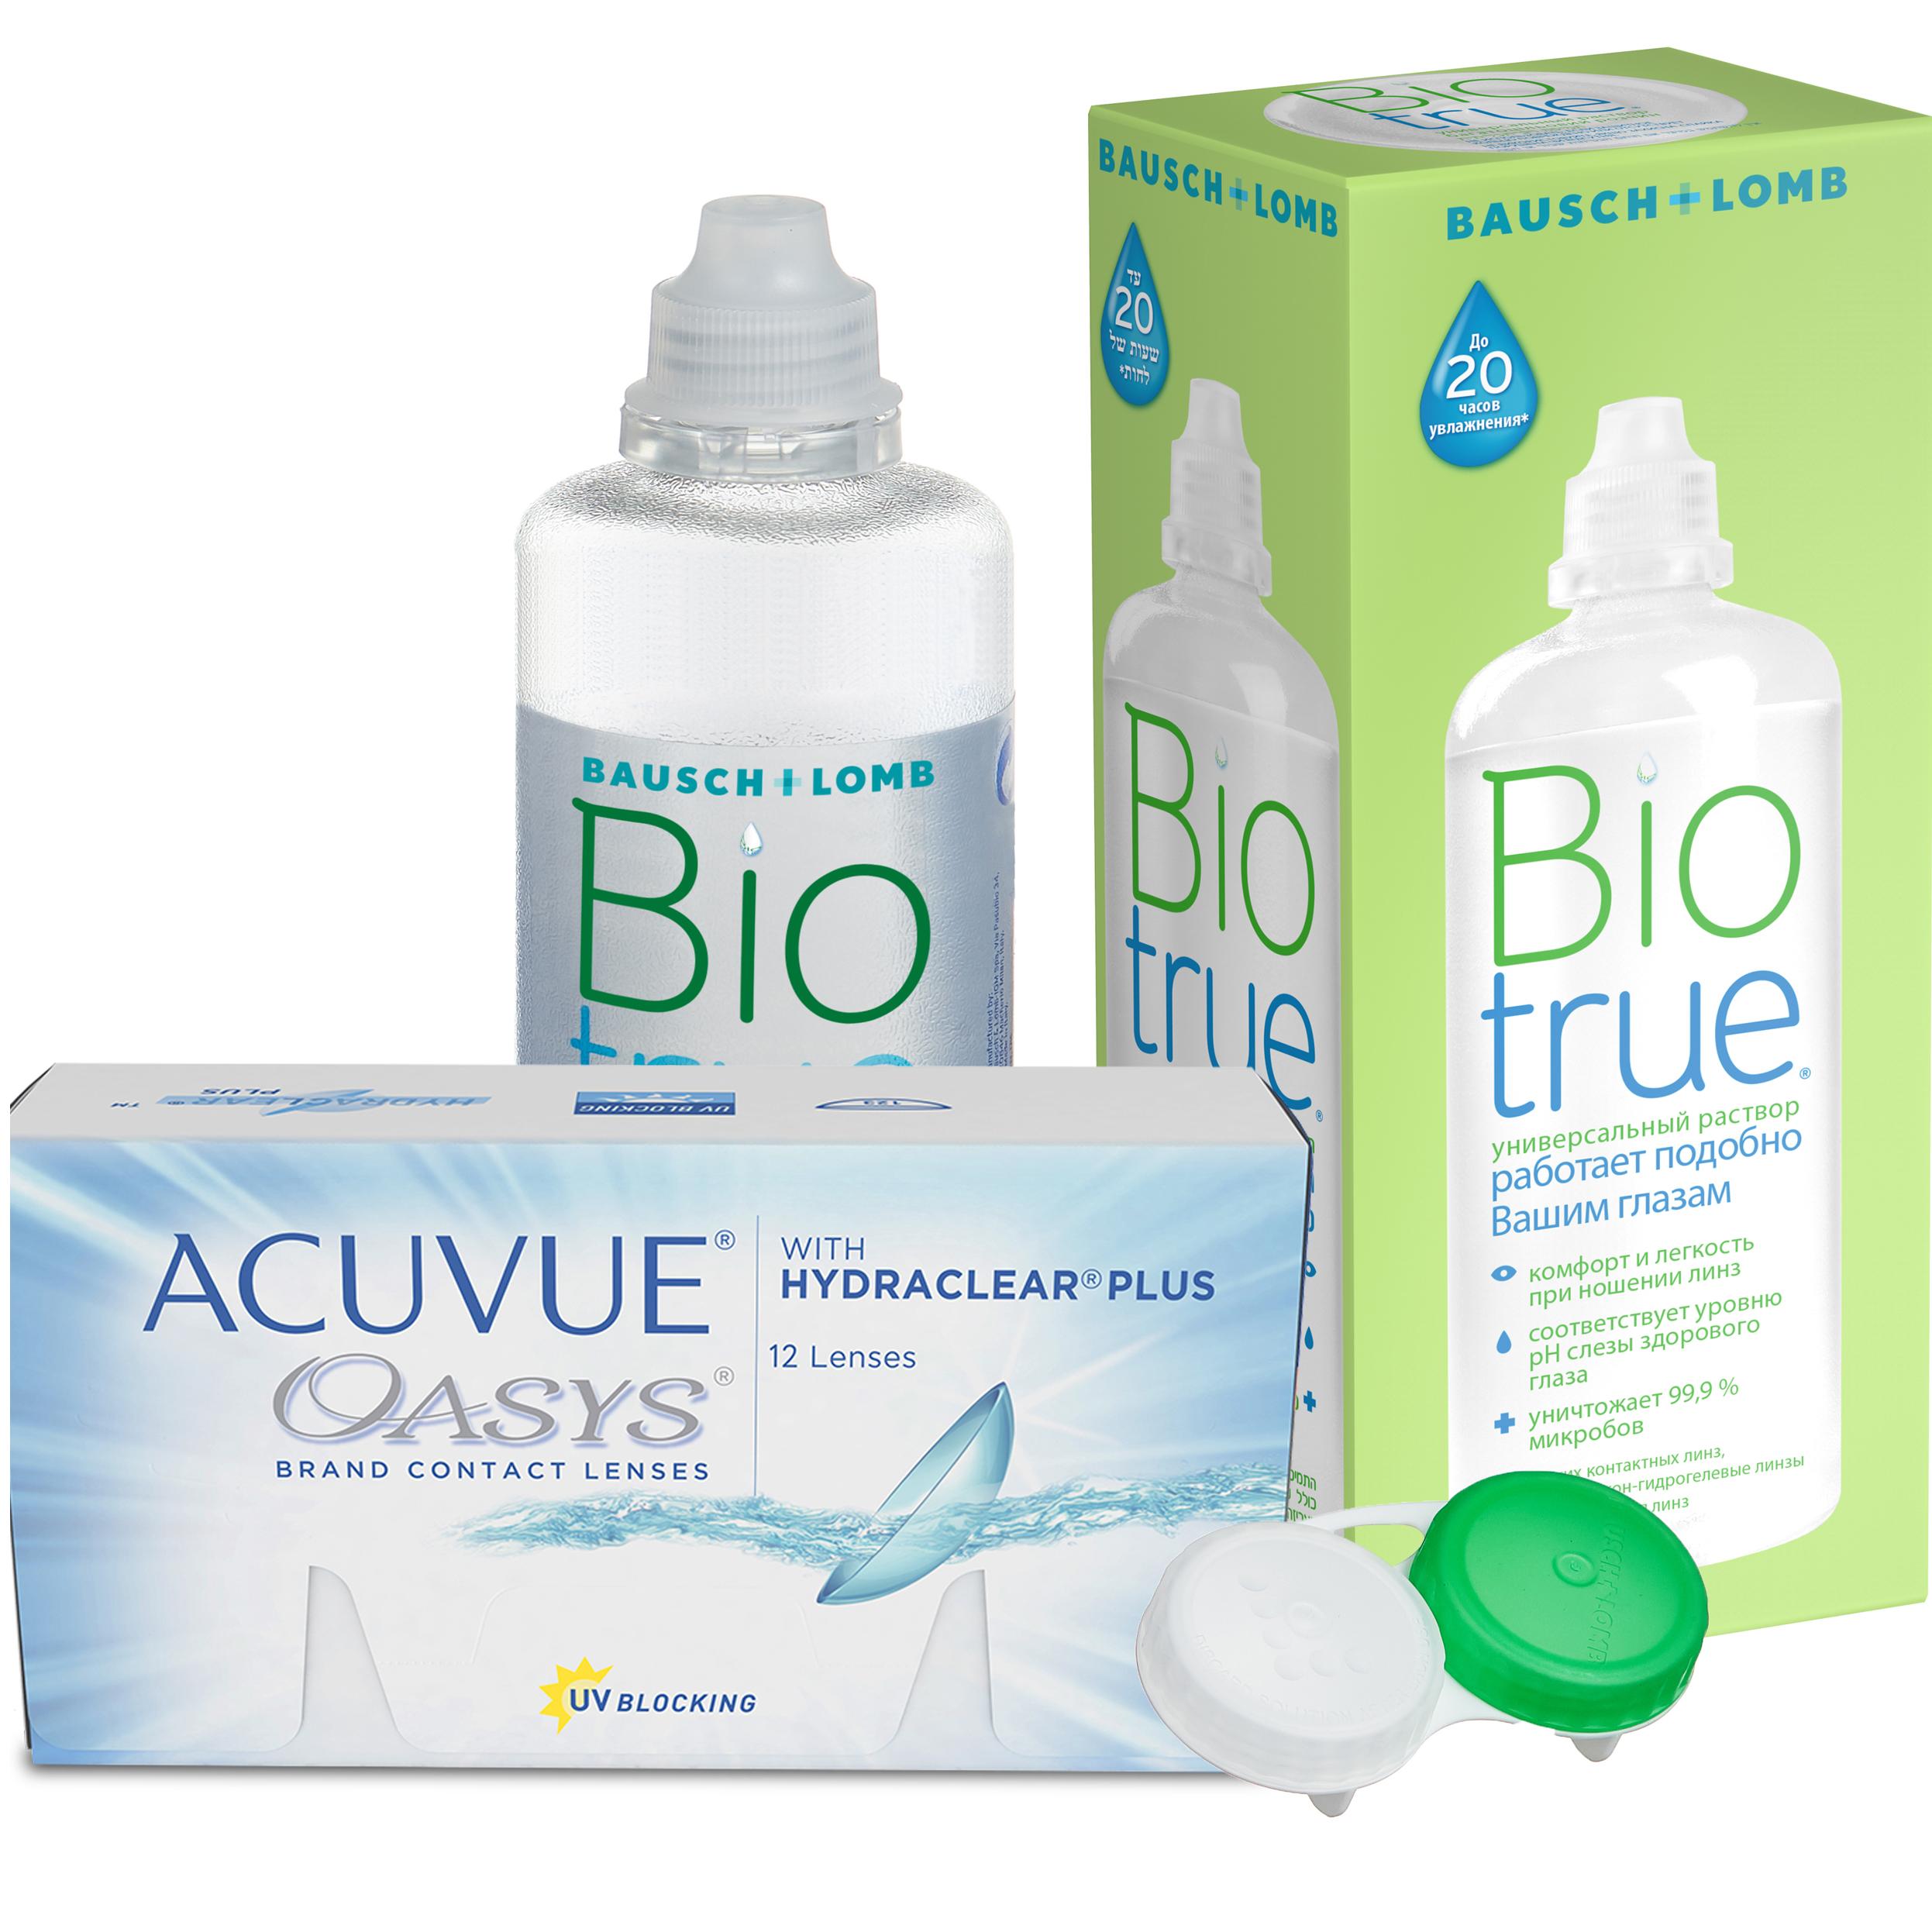 Купить Oasys with Hydraclear Plus 12 линз + Biotrue, Контактные линзы Acuvue Oasys with Hydraclear Plus 12 линз R 8.8 +0, 25 + Biotrue 300 мл